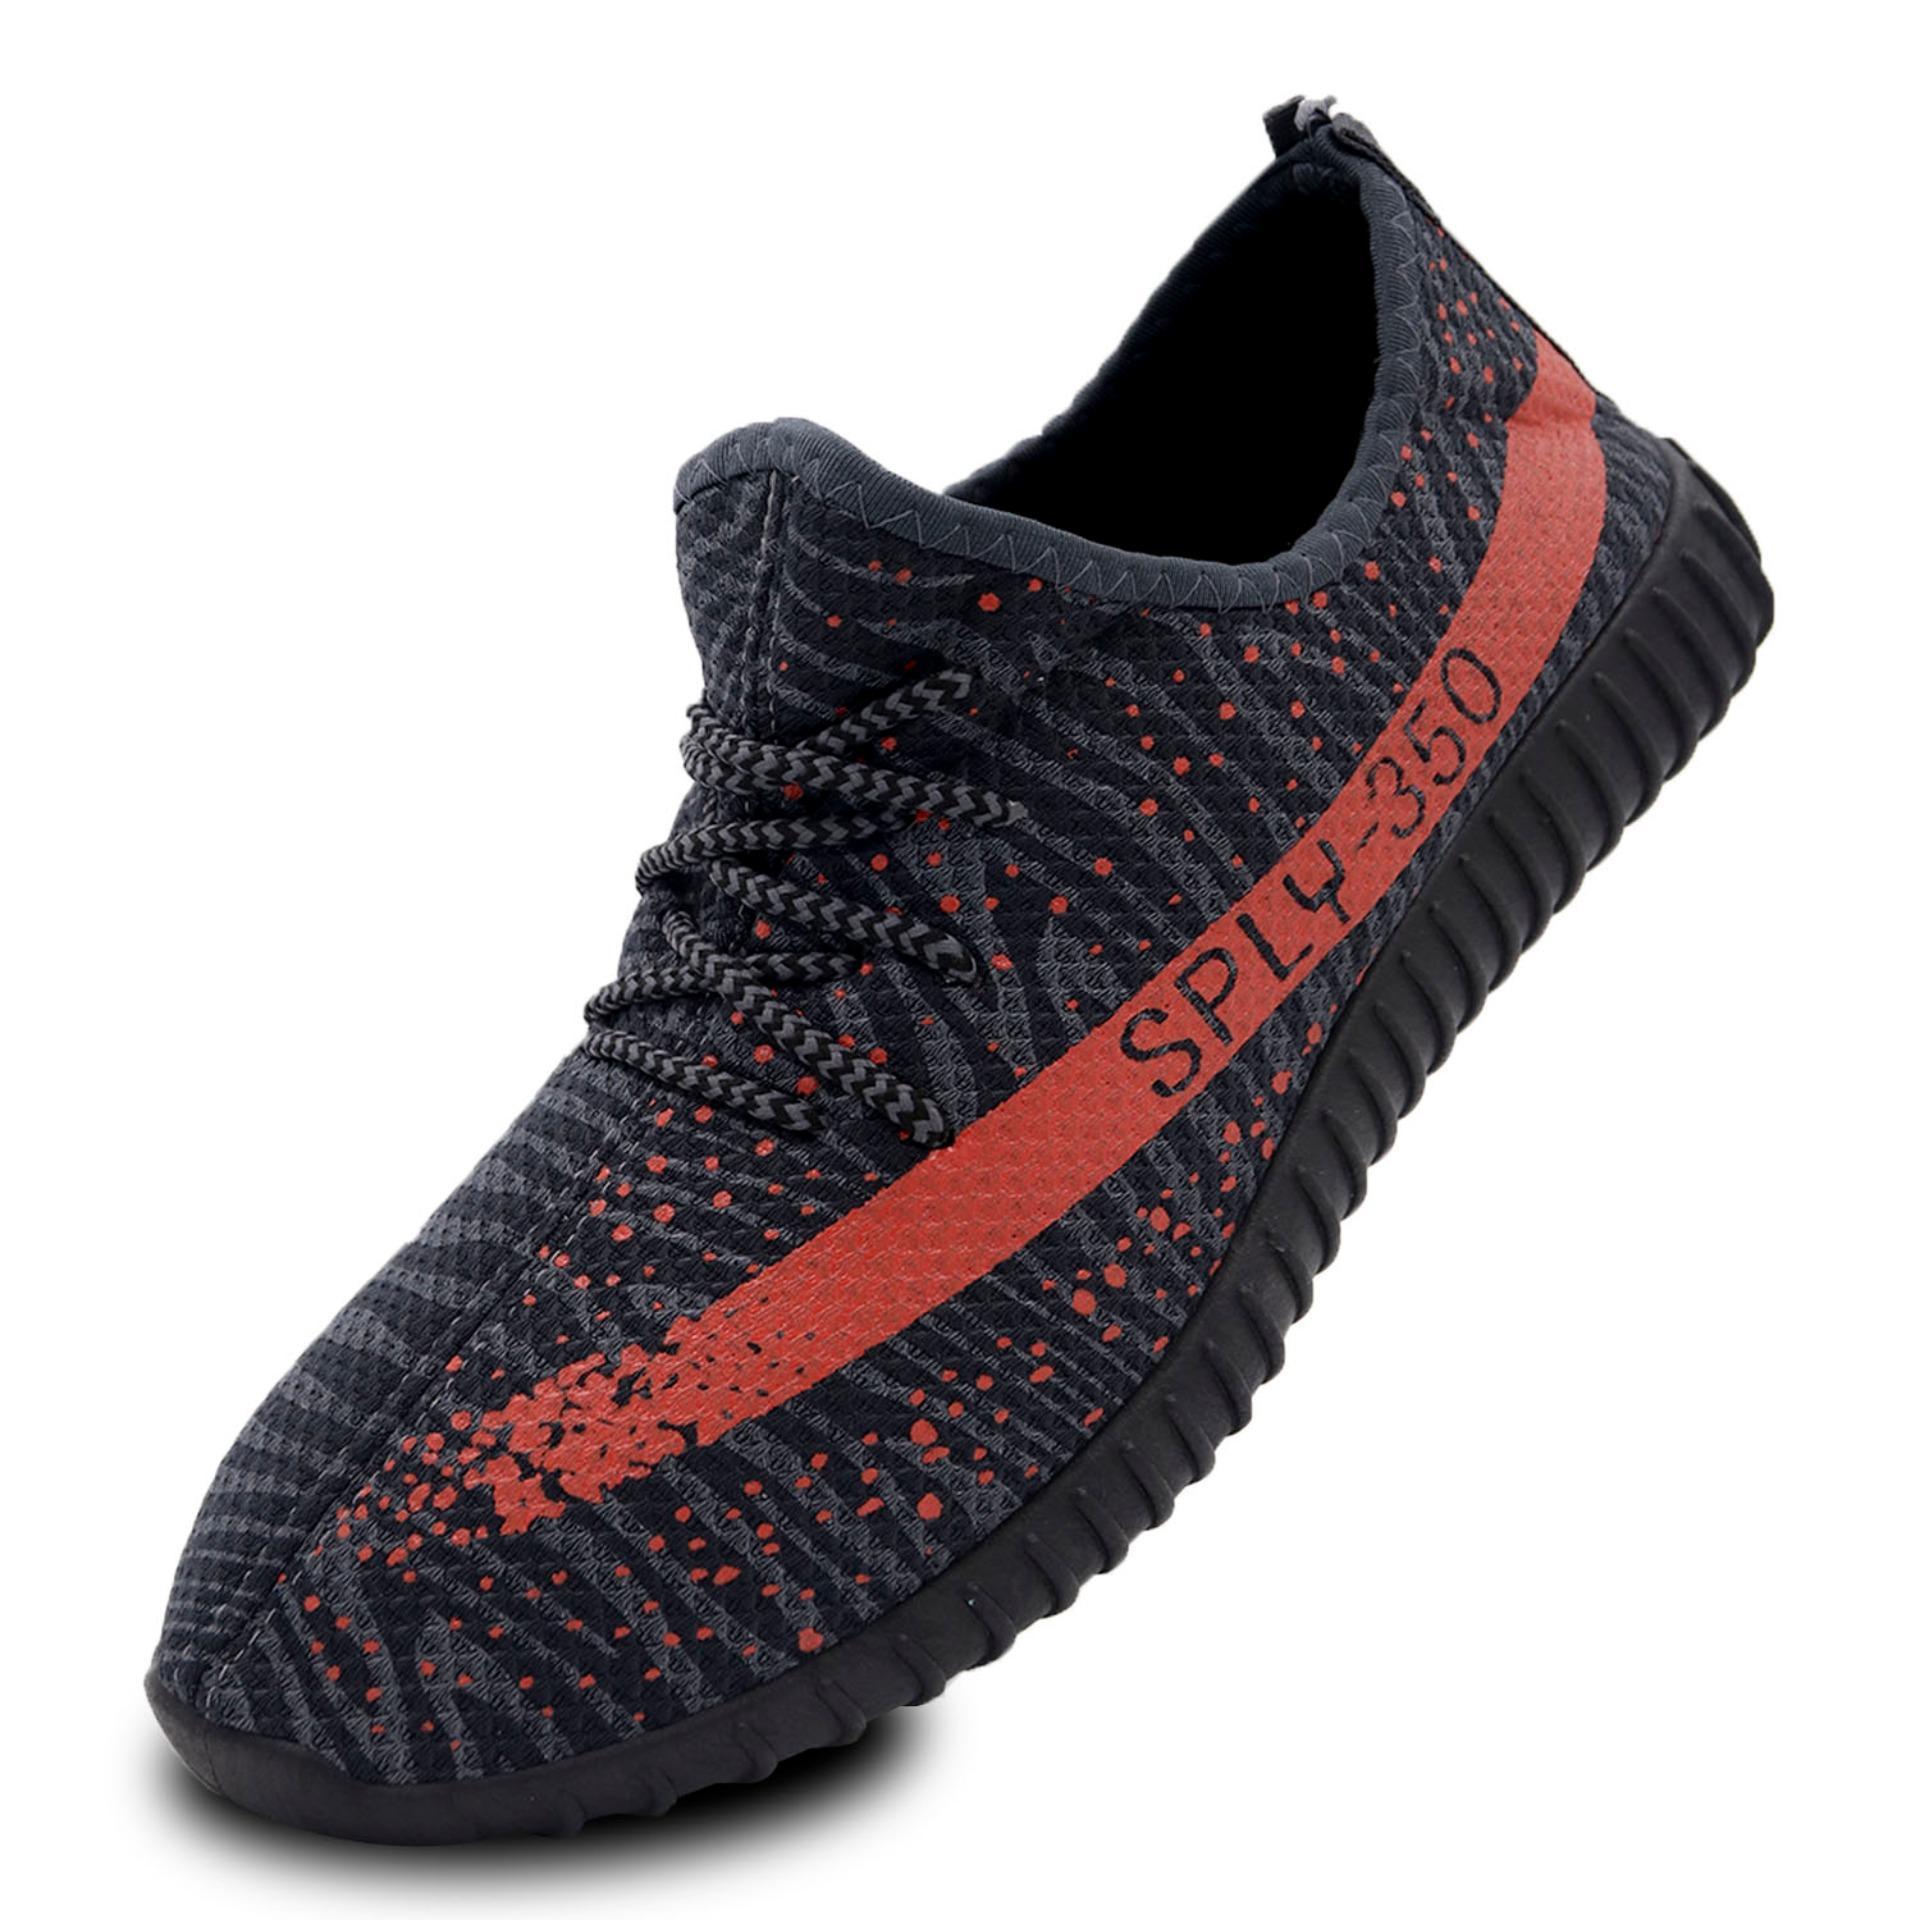 Spek Pria Model Sepatu Olahraga Stylish Comfortable Men Sneaker Yzy Sply 350 Dark Grey Quincylabel